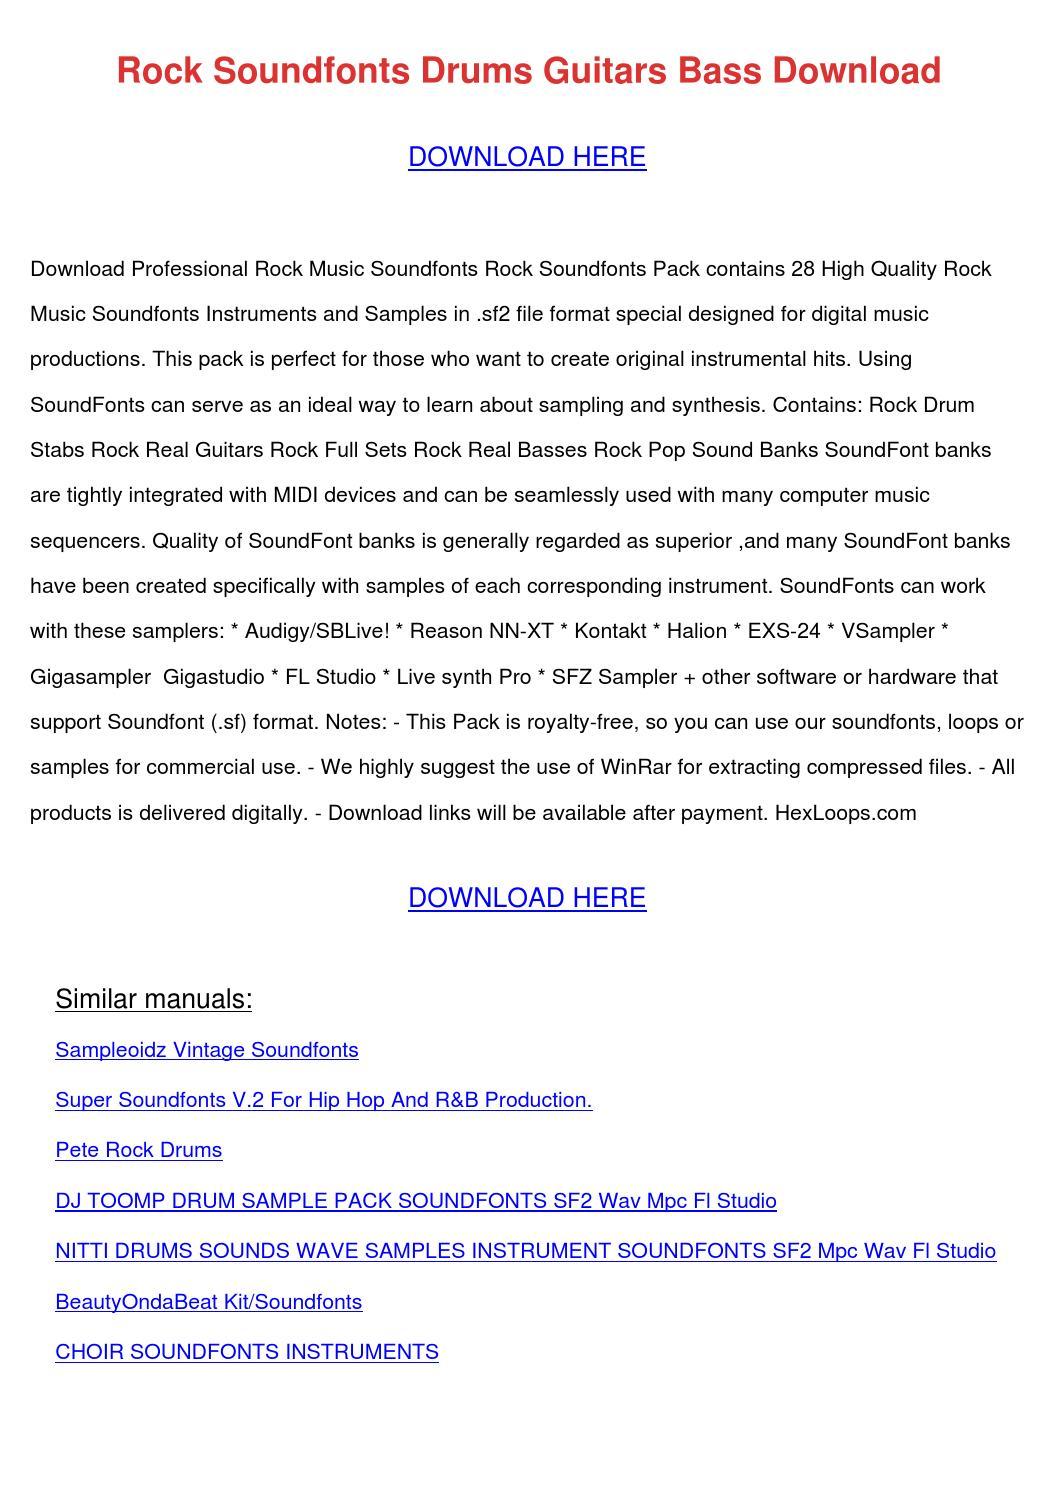 Rock Soundfonts Drums Guitars Bass Download by PedroNeuman